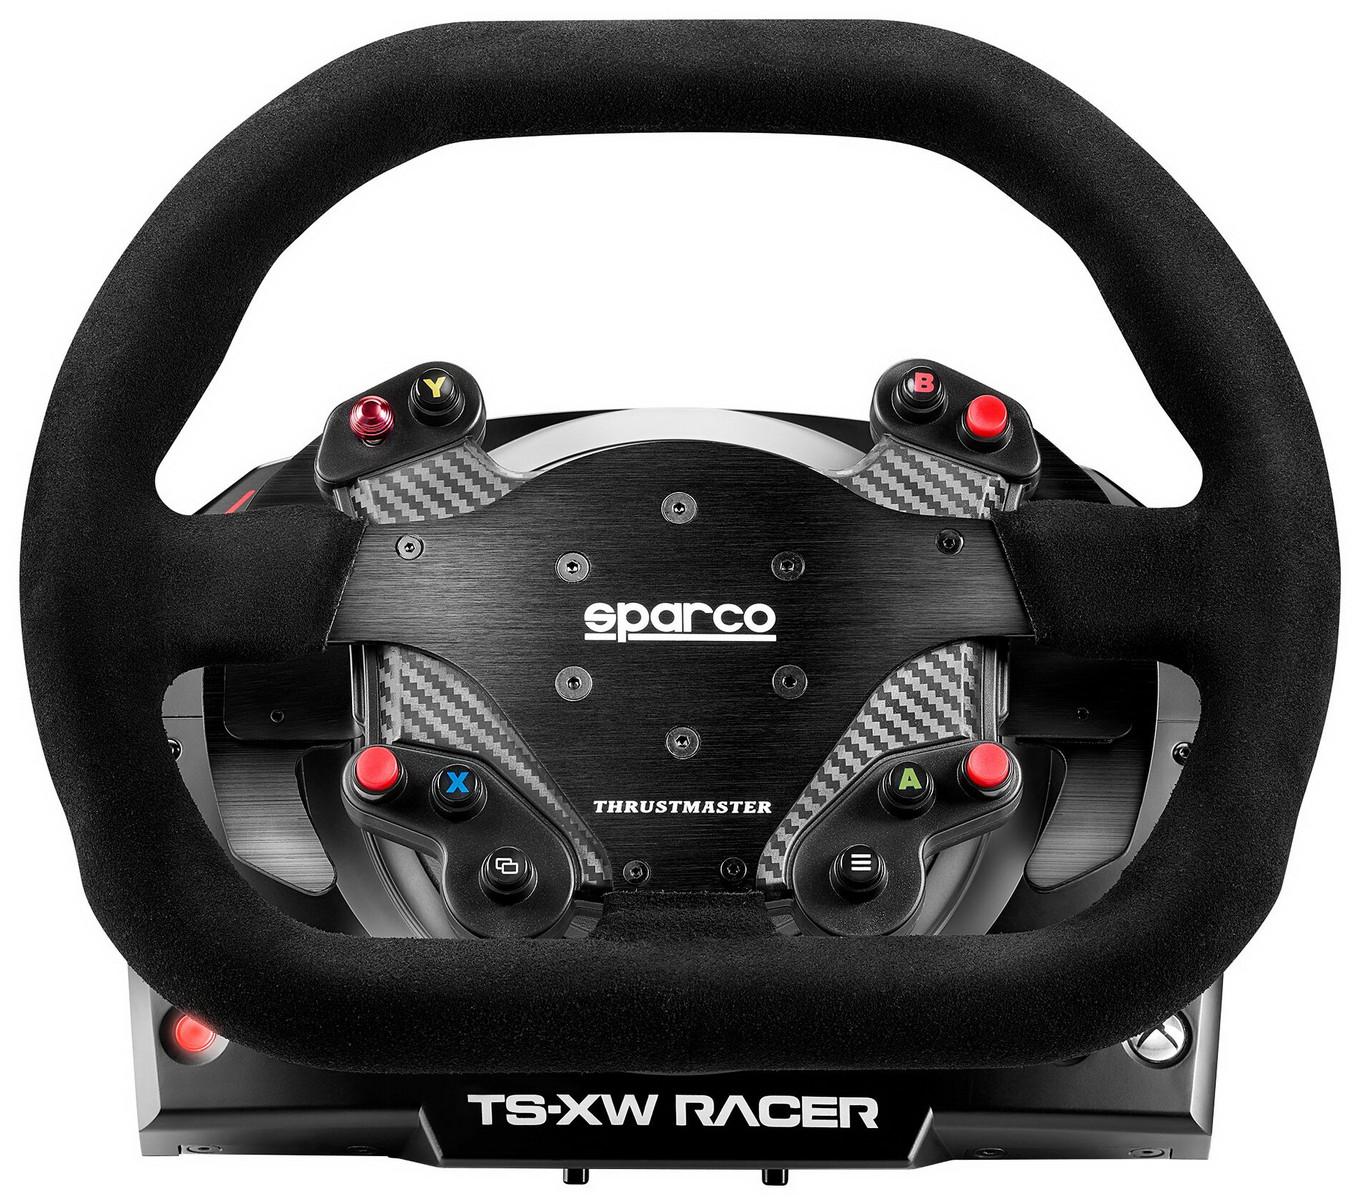 Gamescom 2017 Thrustmaster Ts Xw Racer Sparco P310